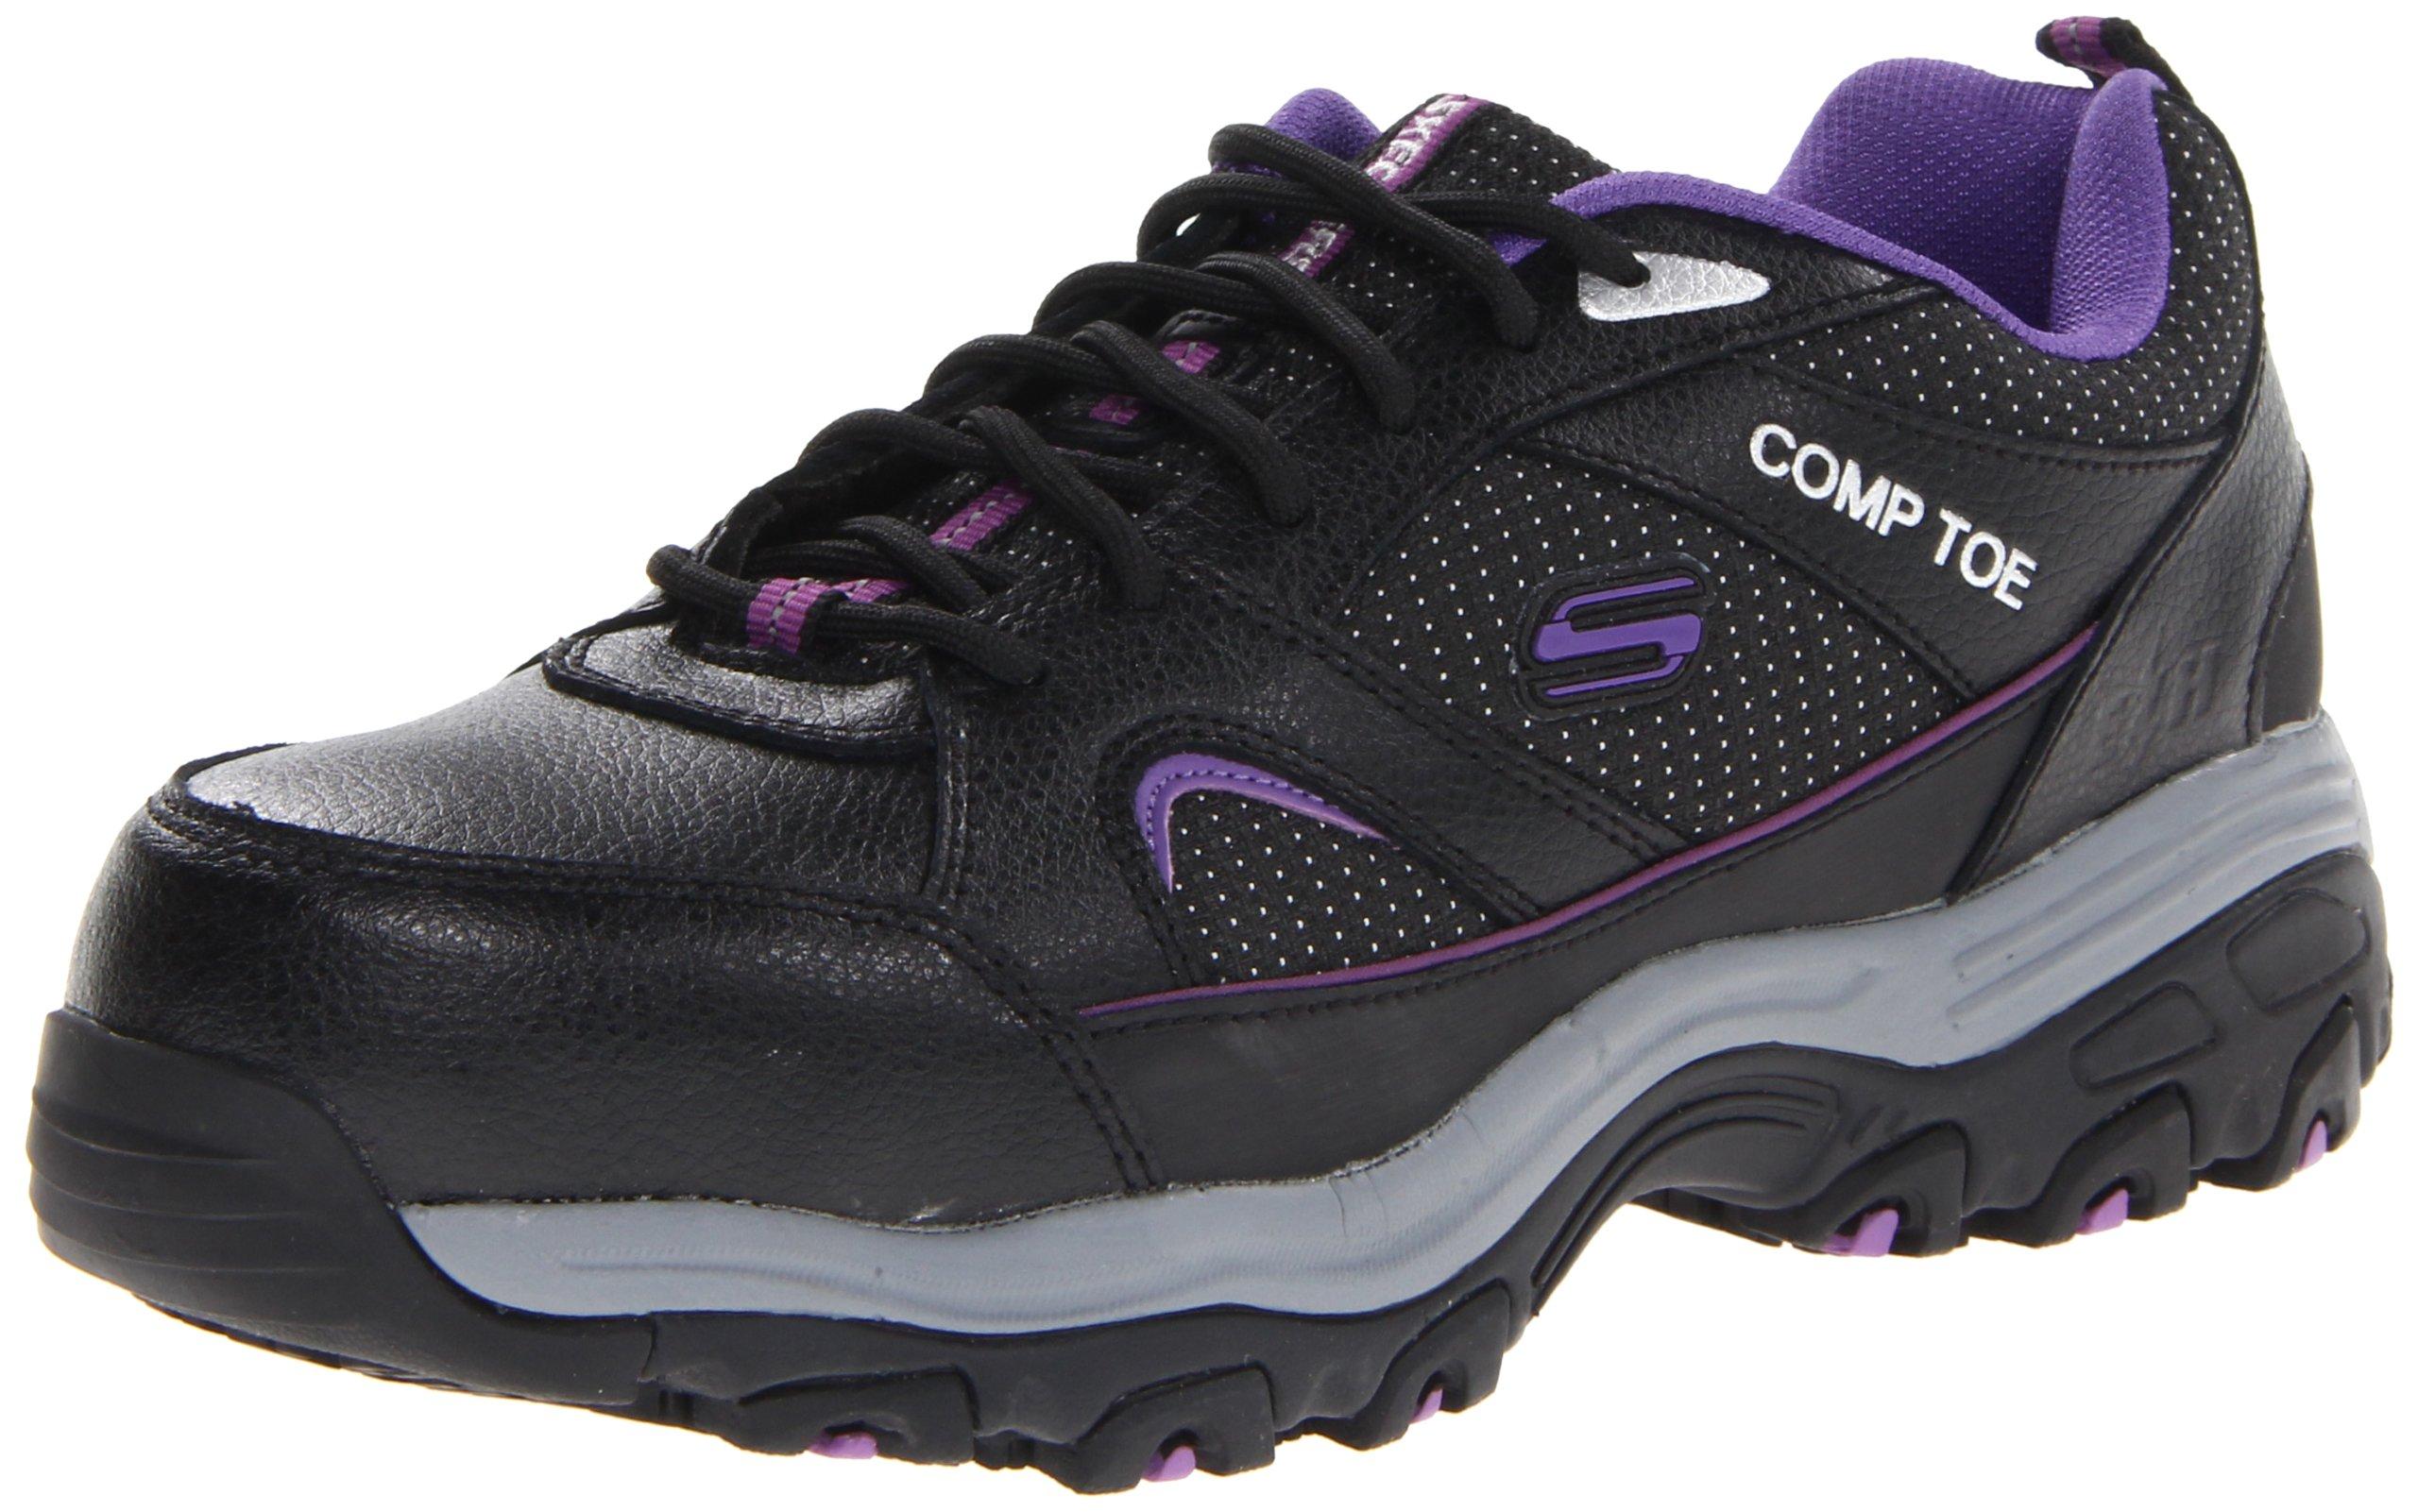 Skechers for Work Women's D'Lite SR Slip Resistant Work Shoe, Black/Purple, 11 M US